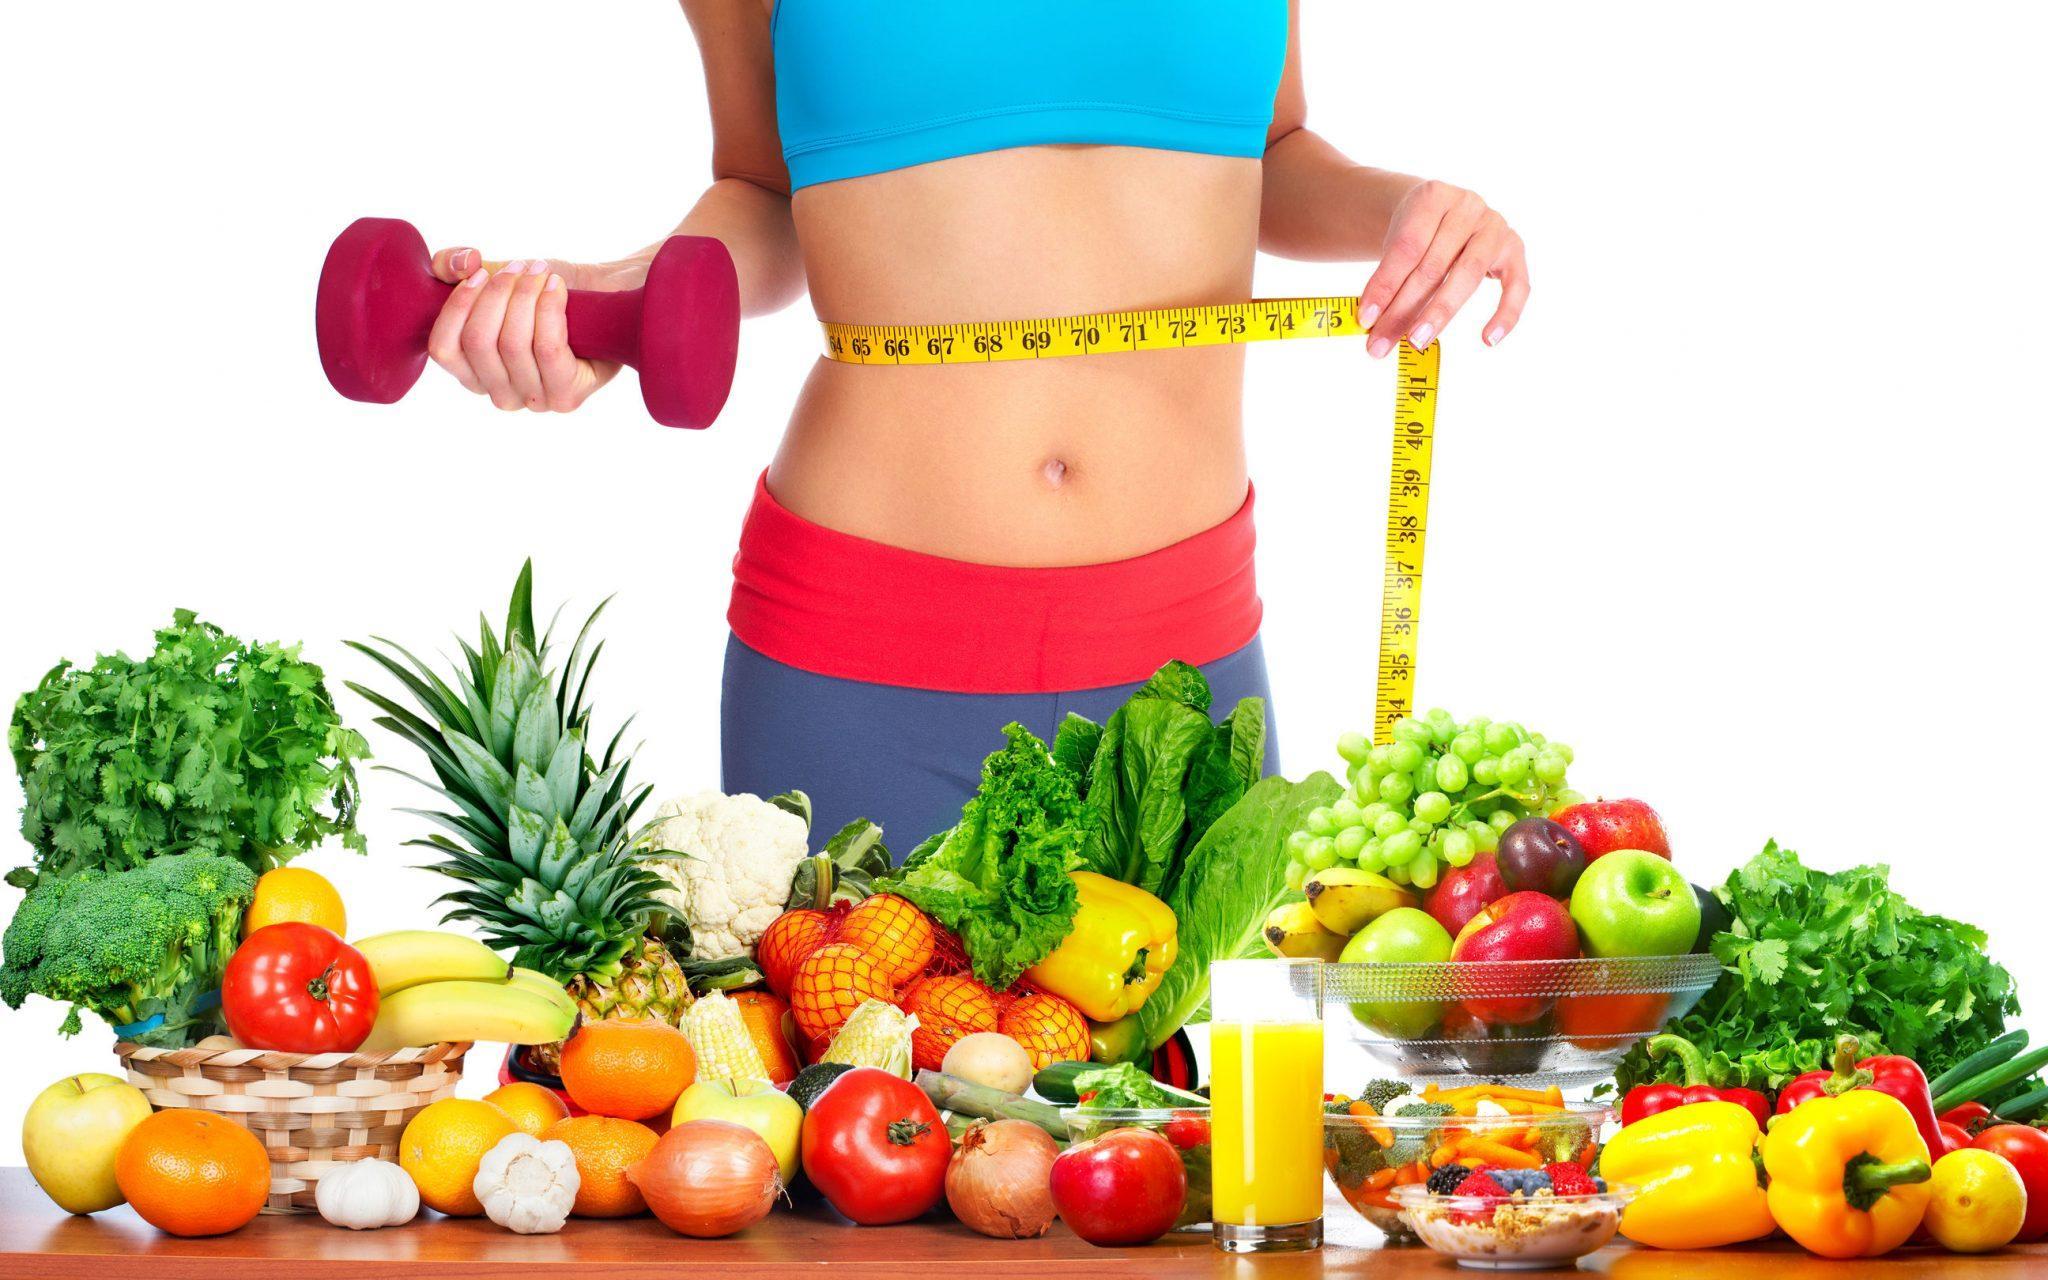 Kak правильно похудеть